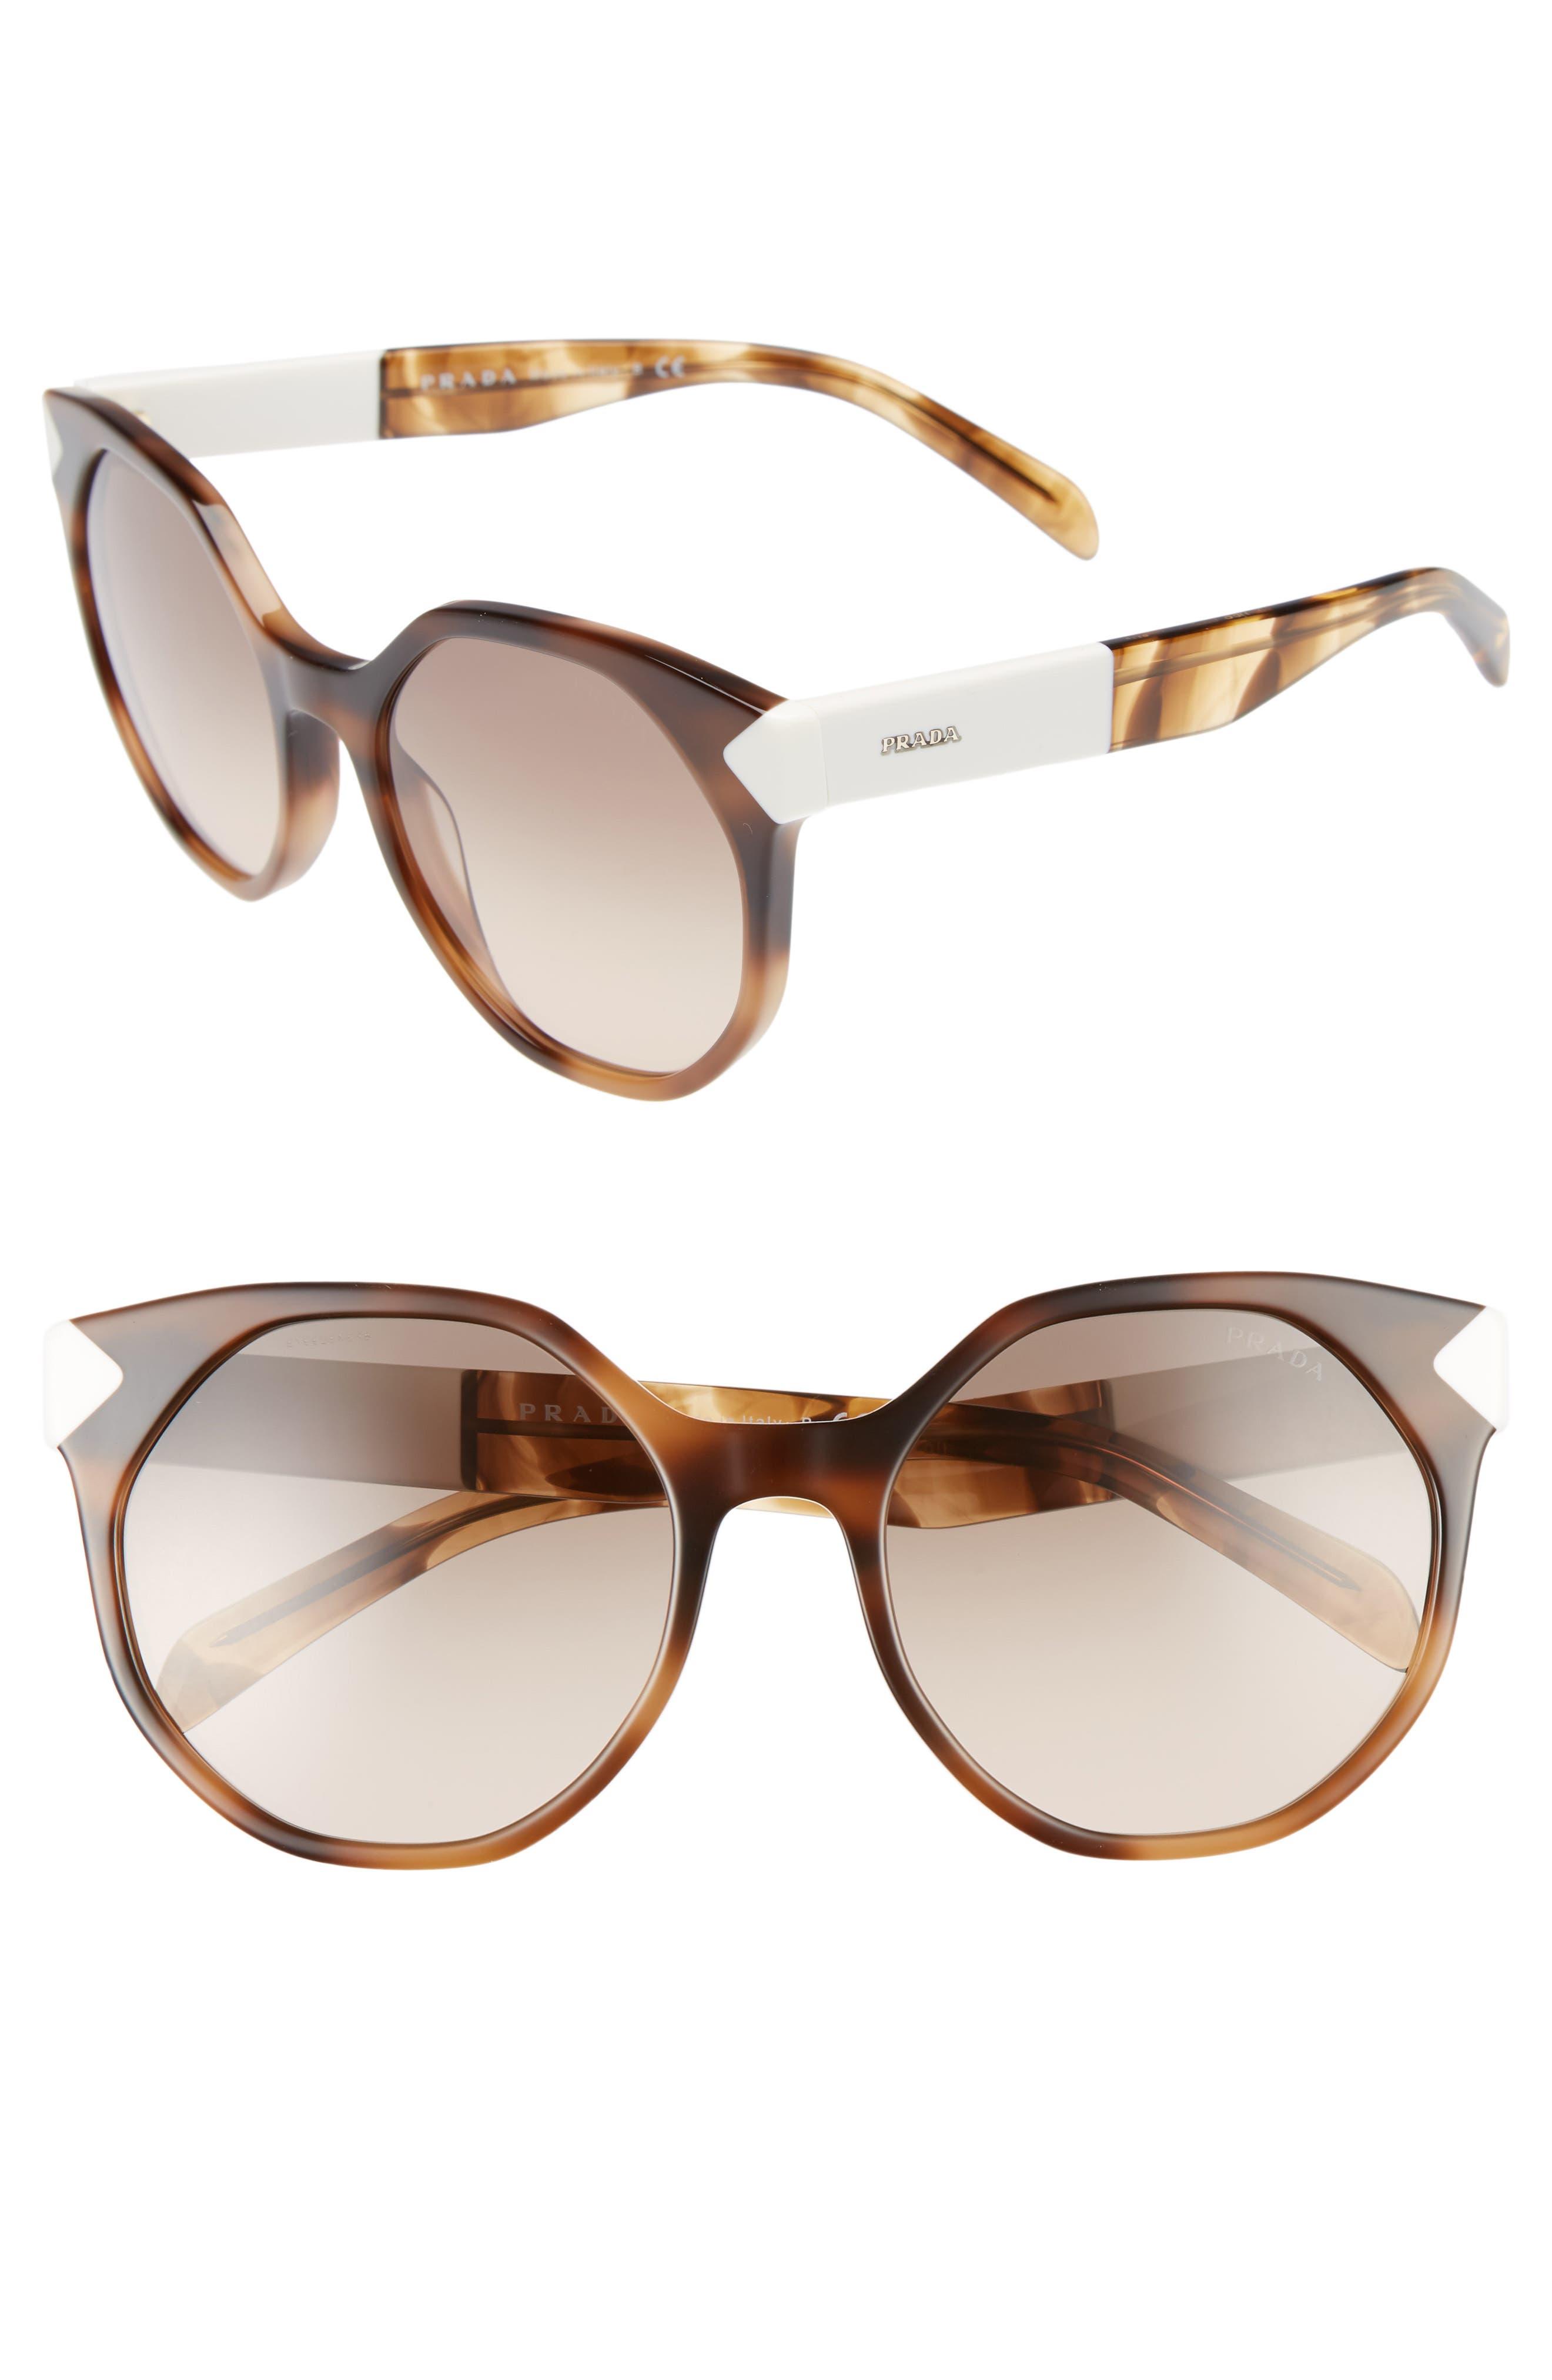 55mm Gradient Geometric Sunglasses,                         Main,                         color, 200